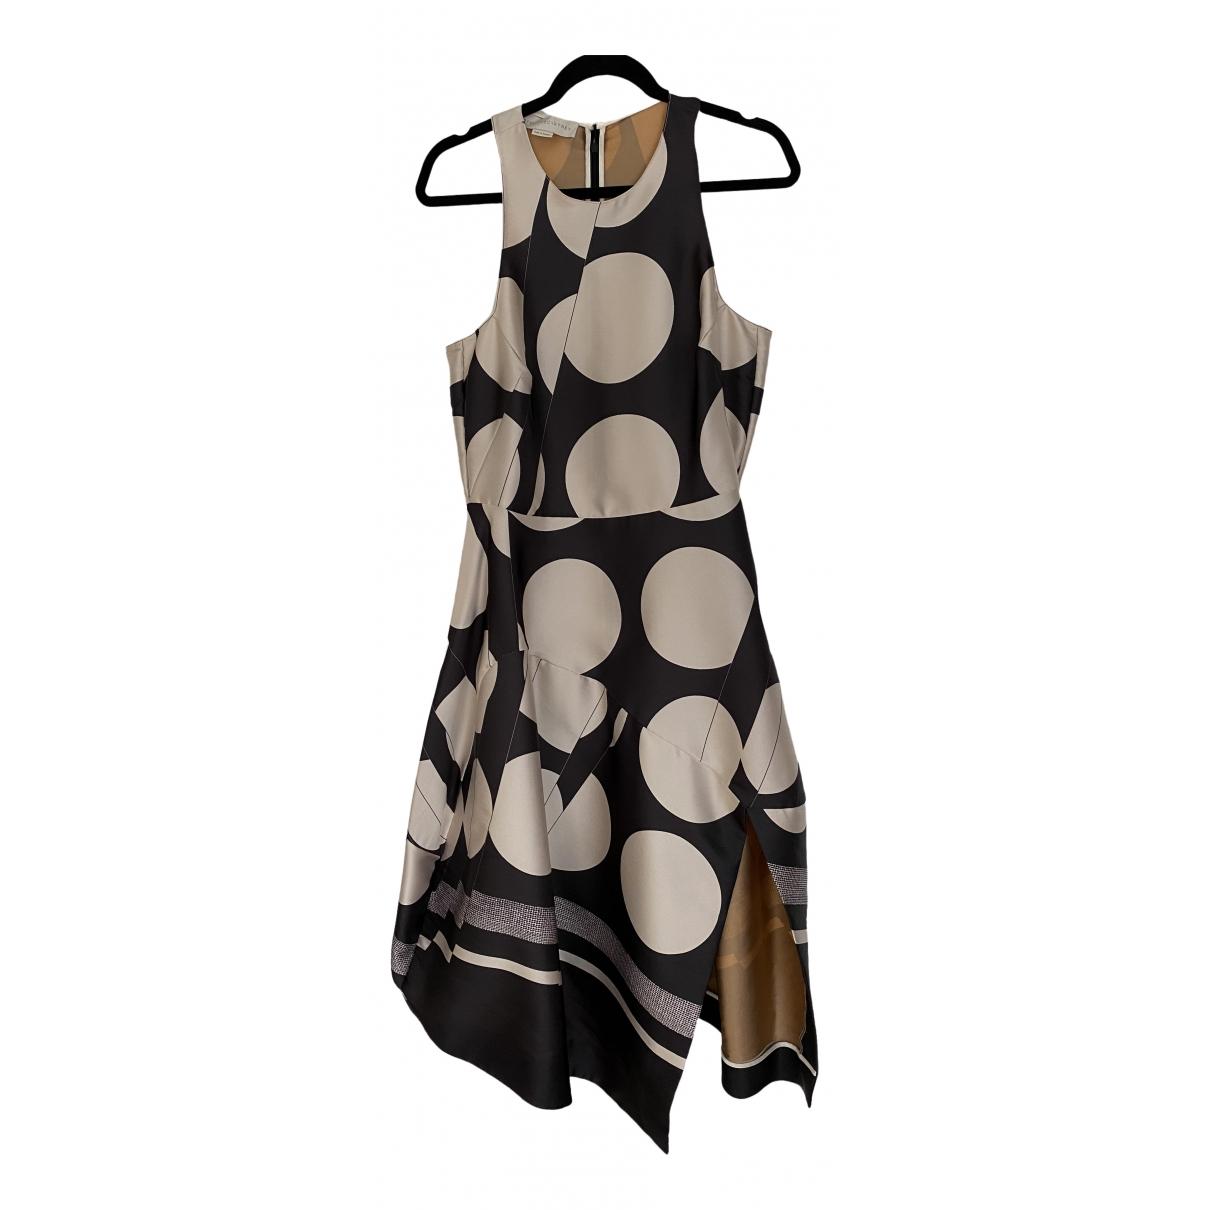 Stella Mccartney \N Kleid in  Anthrazit Polyester